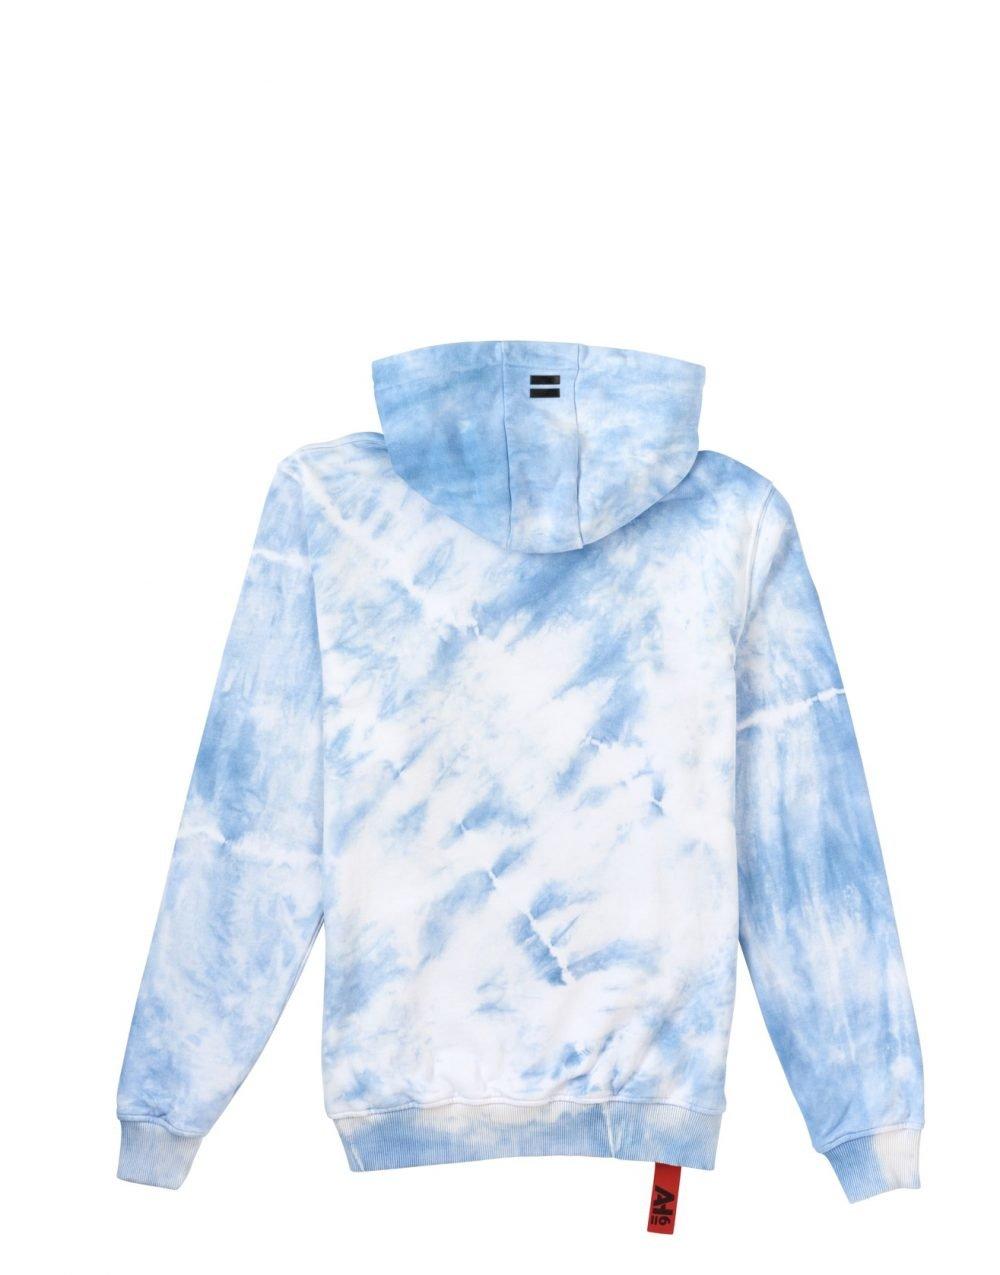 Afbeelding van blauw met witte Hoodie van het merk AH6